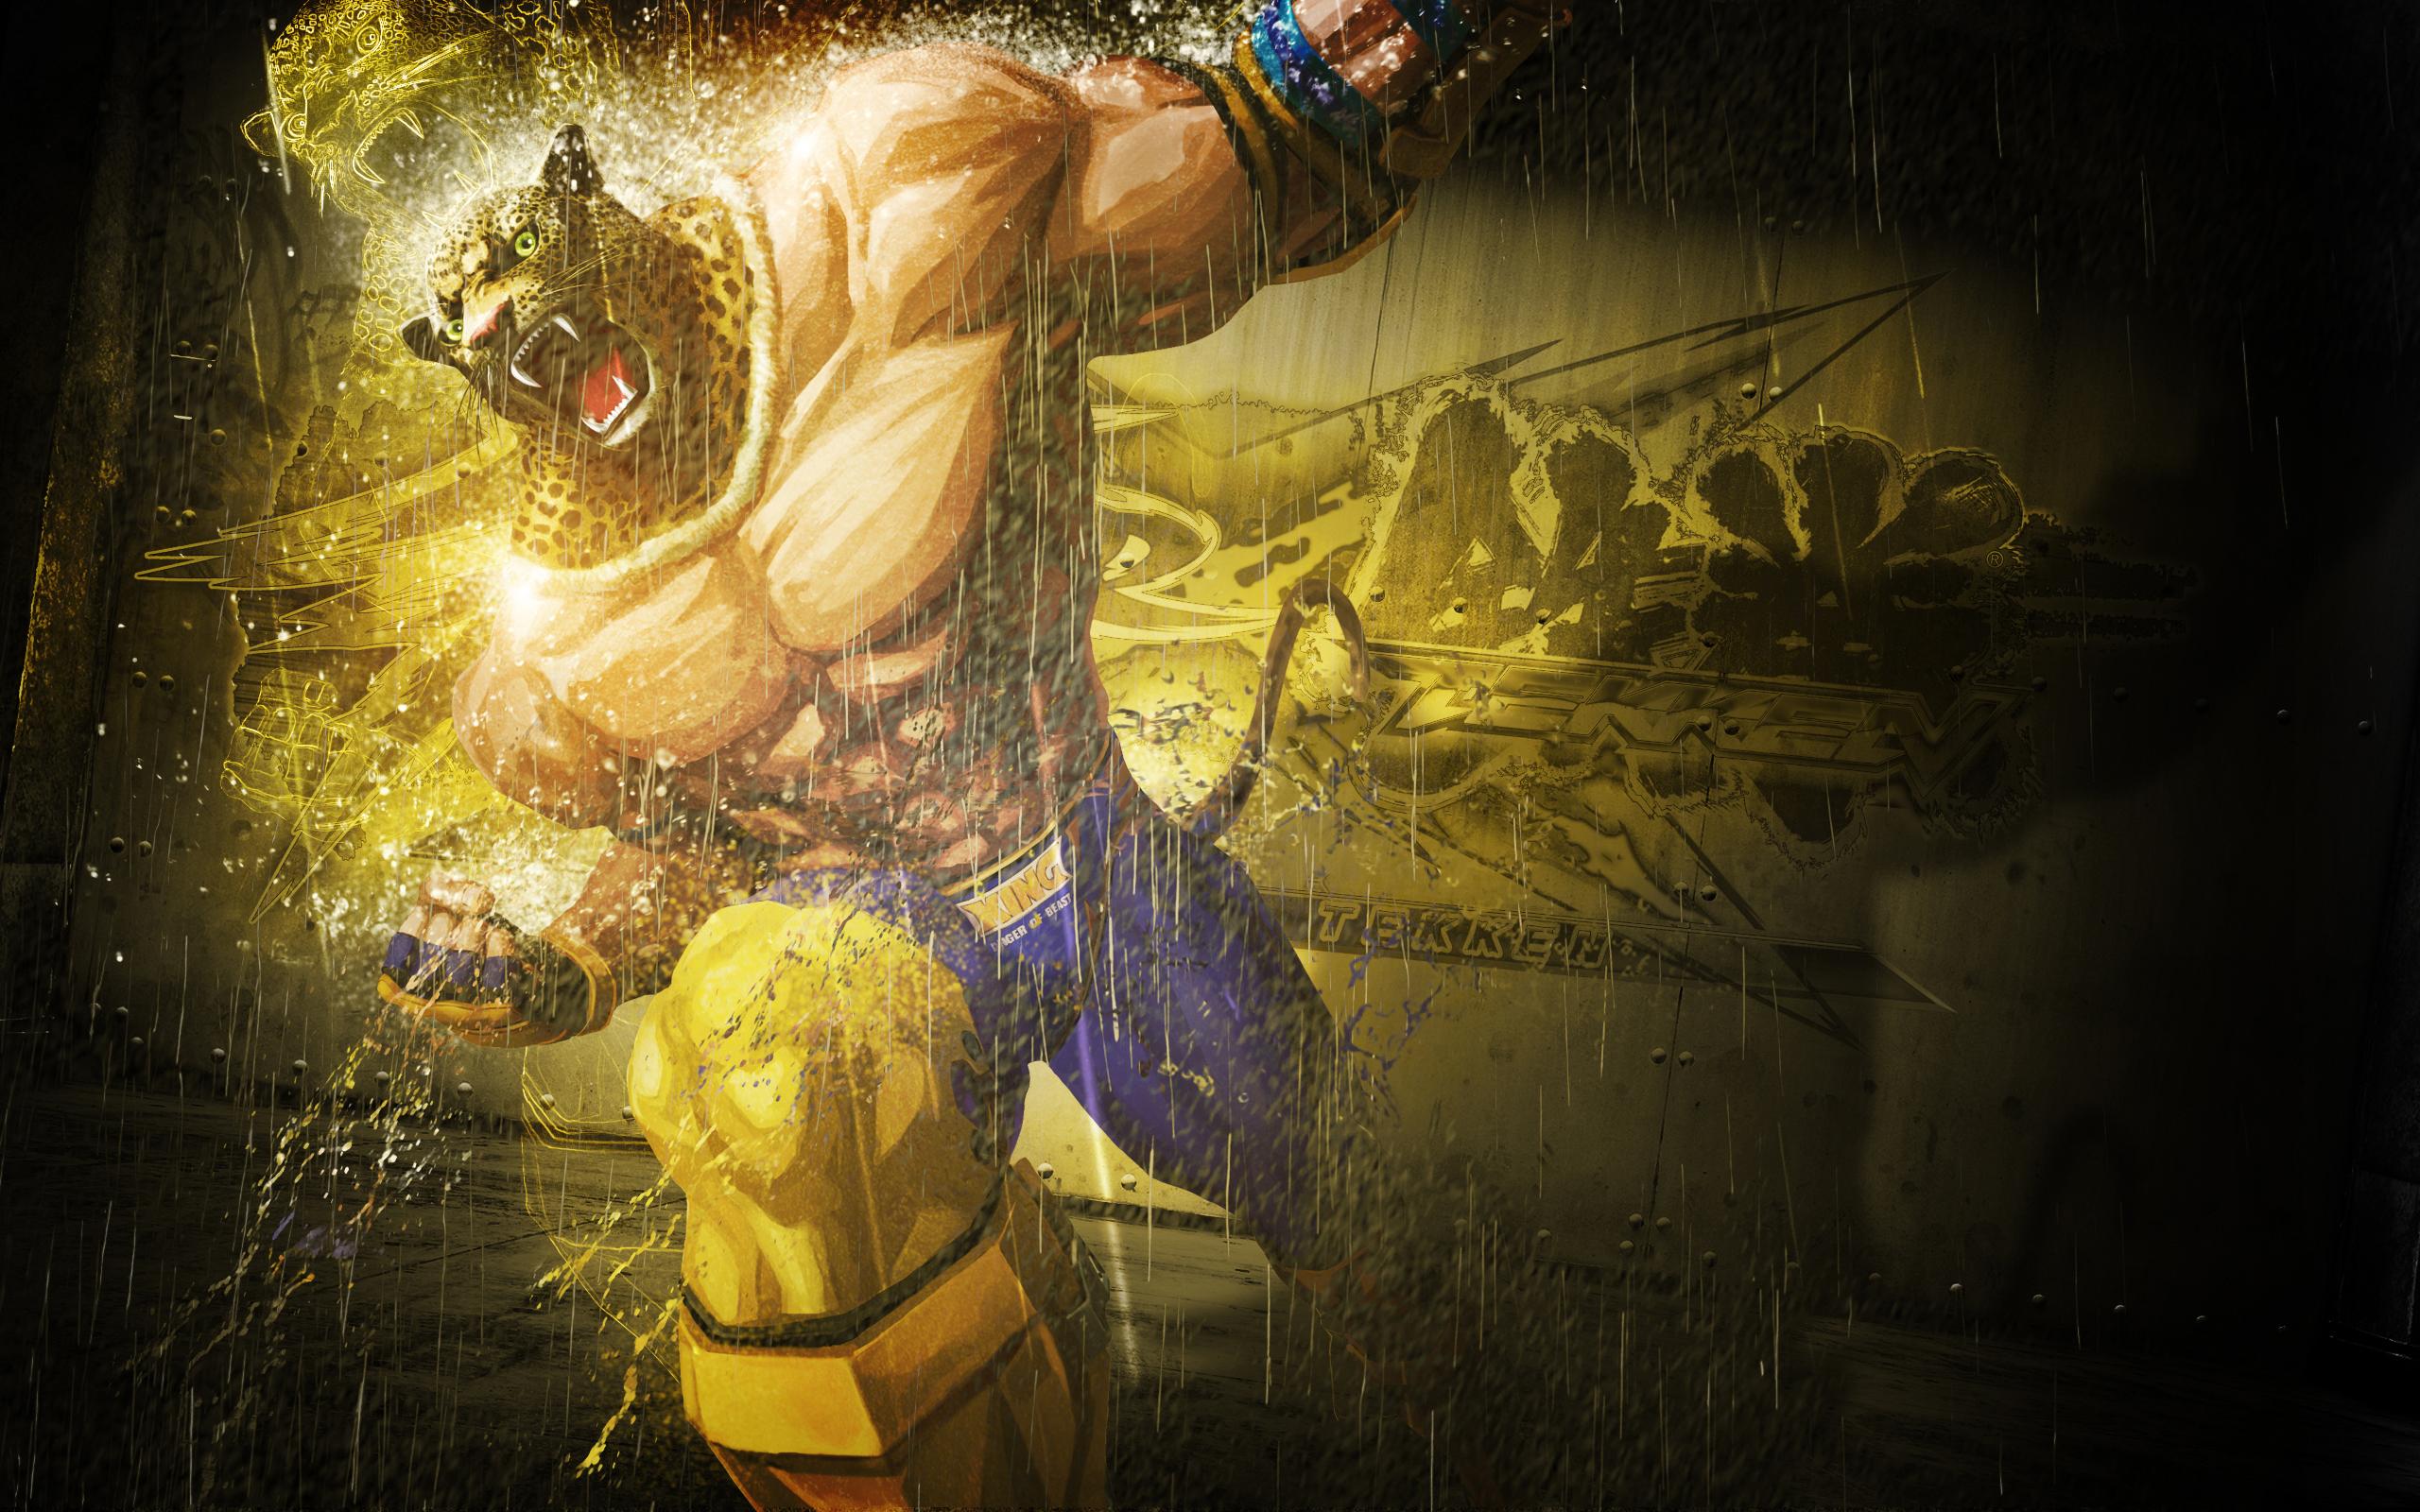 Free Download King In Tekken Wallpapers Hd Wallpapers 2560x1600